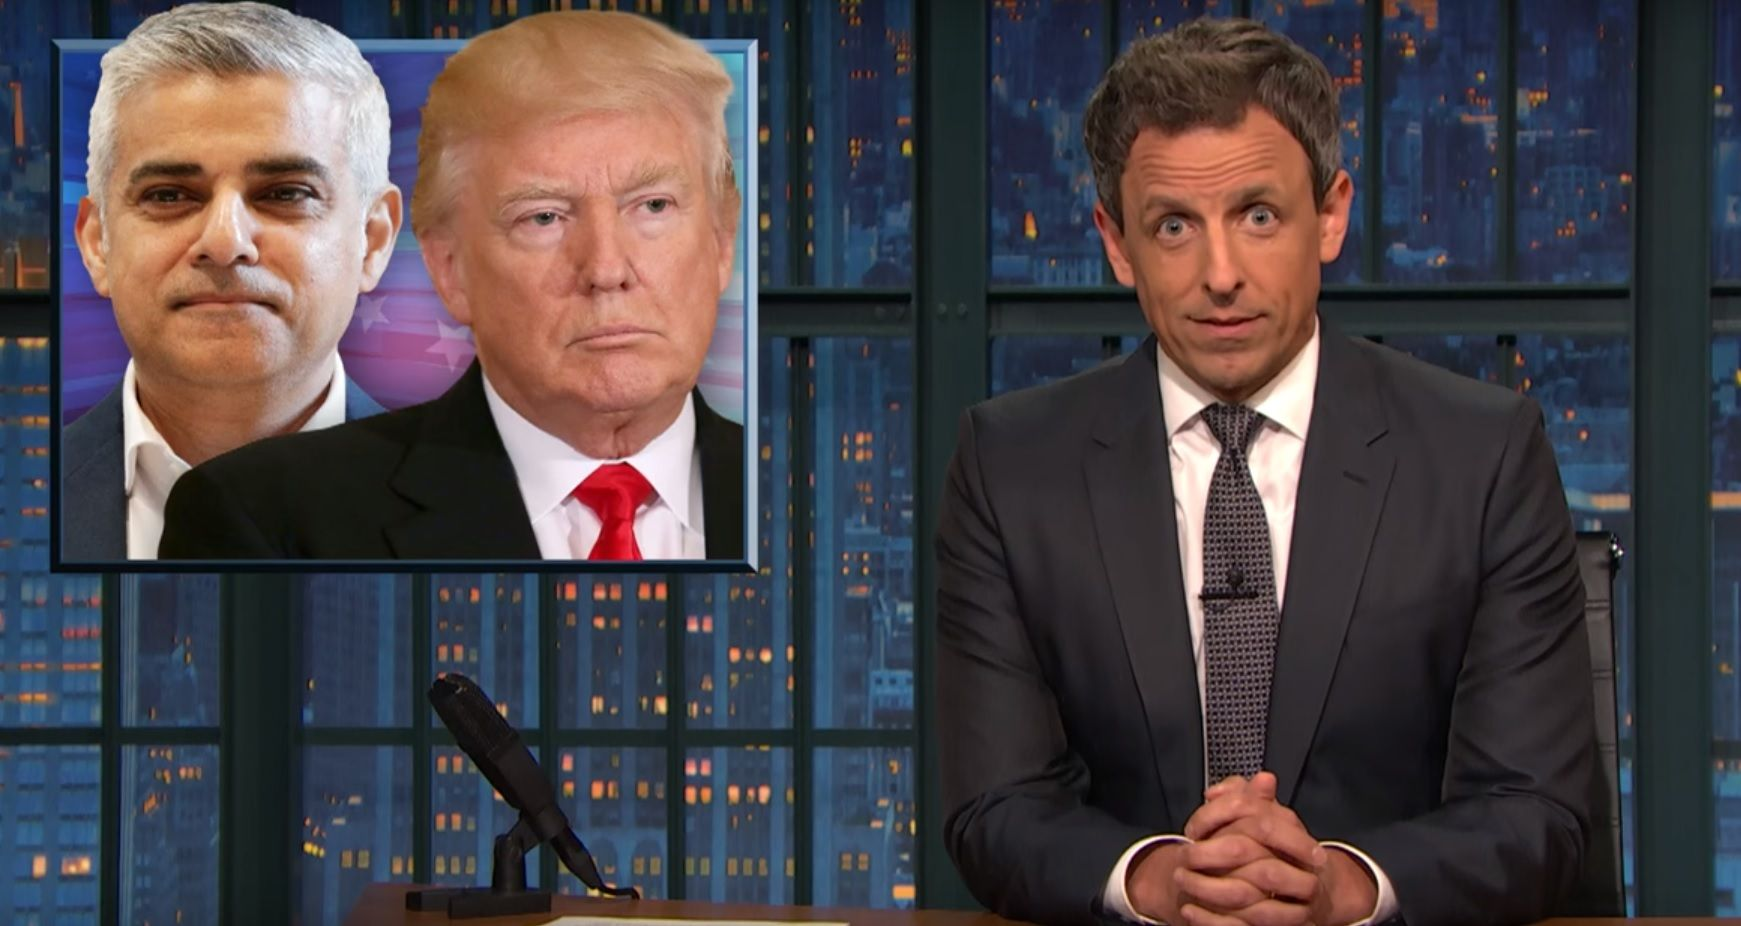 Seth Meyers on Trump slamming Sadiq Khan